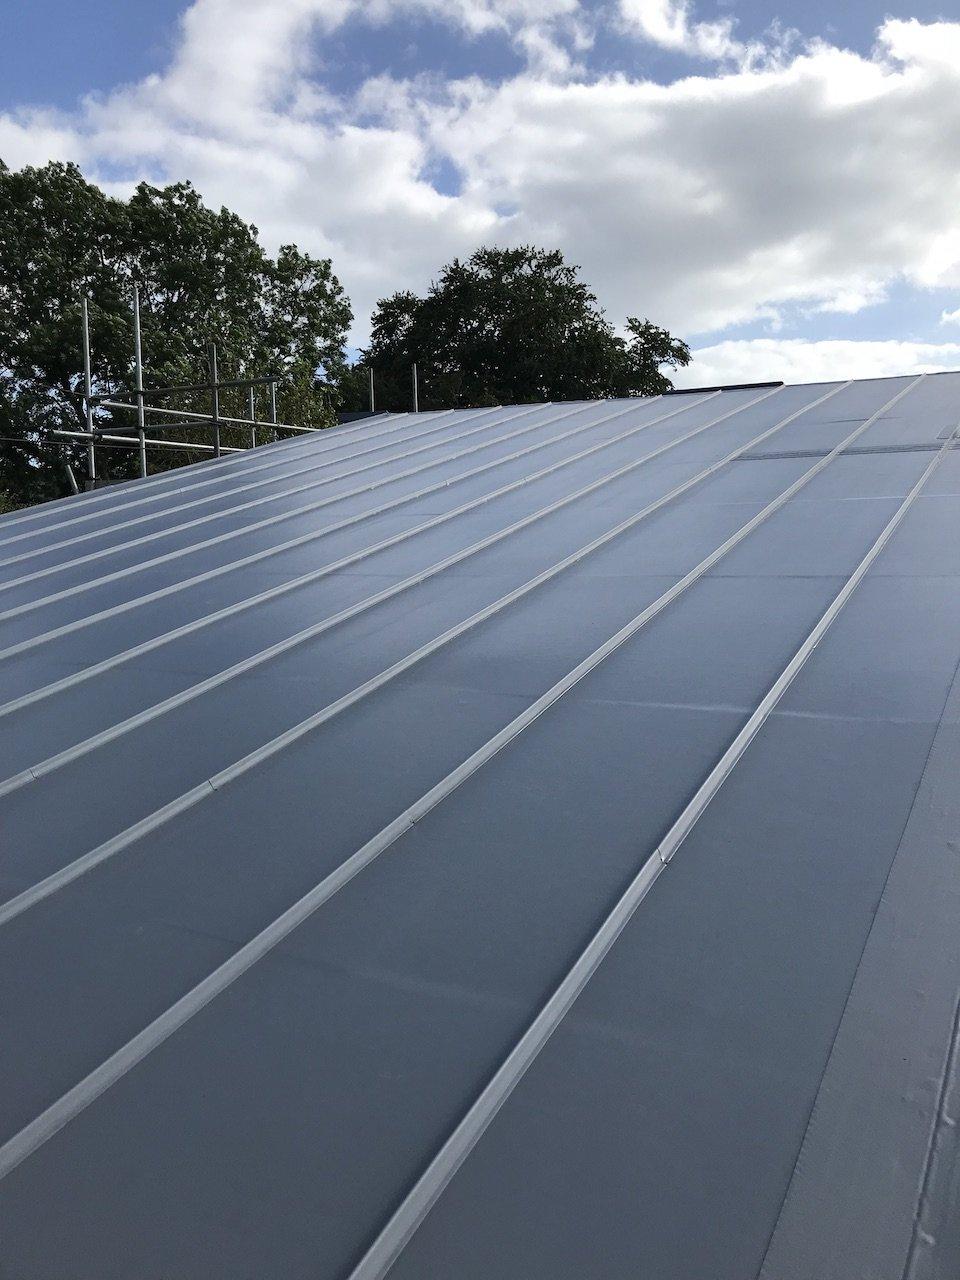 Noss Mayo South Devon single Ply Standing Seam Roof